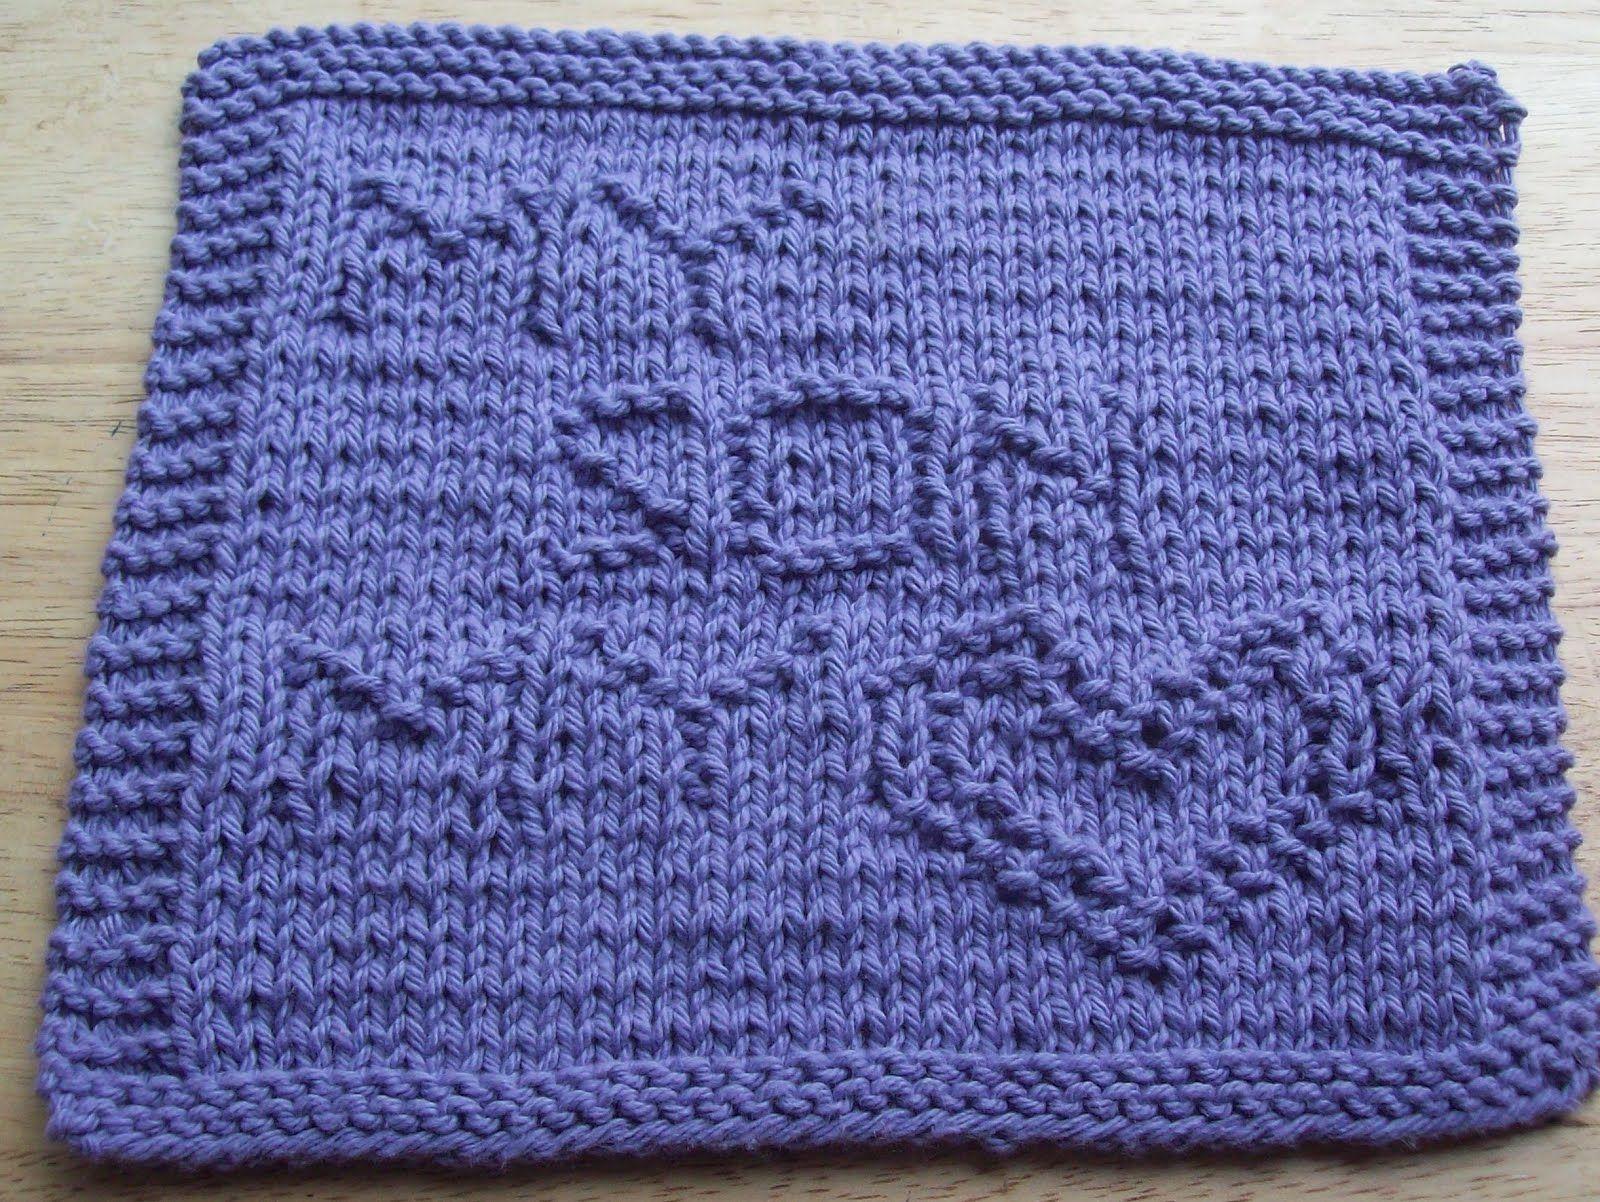 DigKnitty Designs: My Son My Heart Knit Dishcloth Pattern | Knitting ...